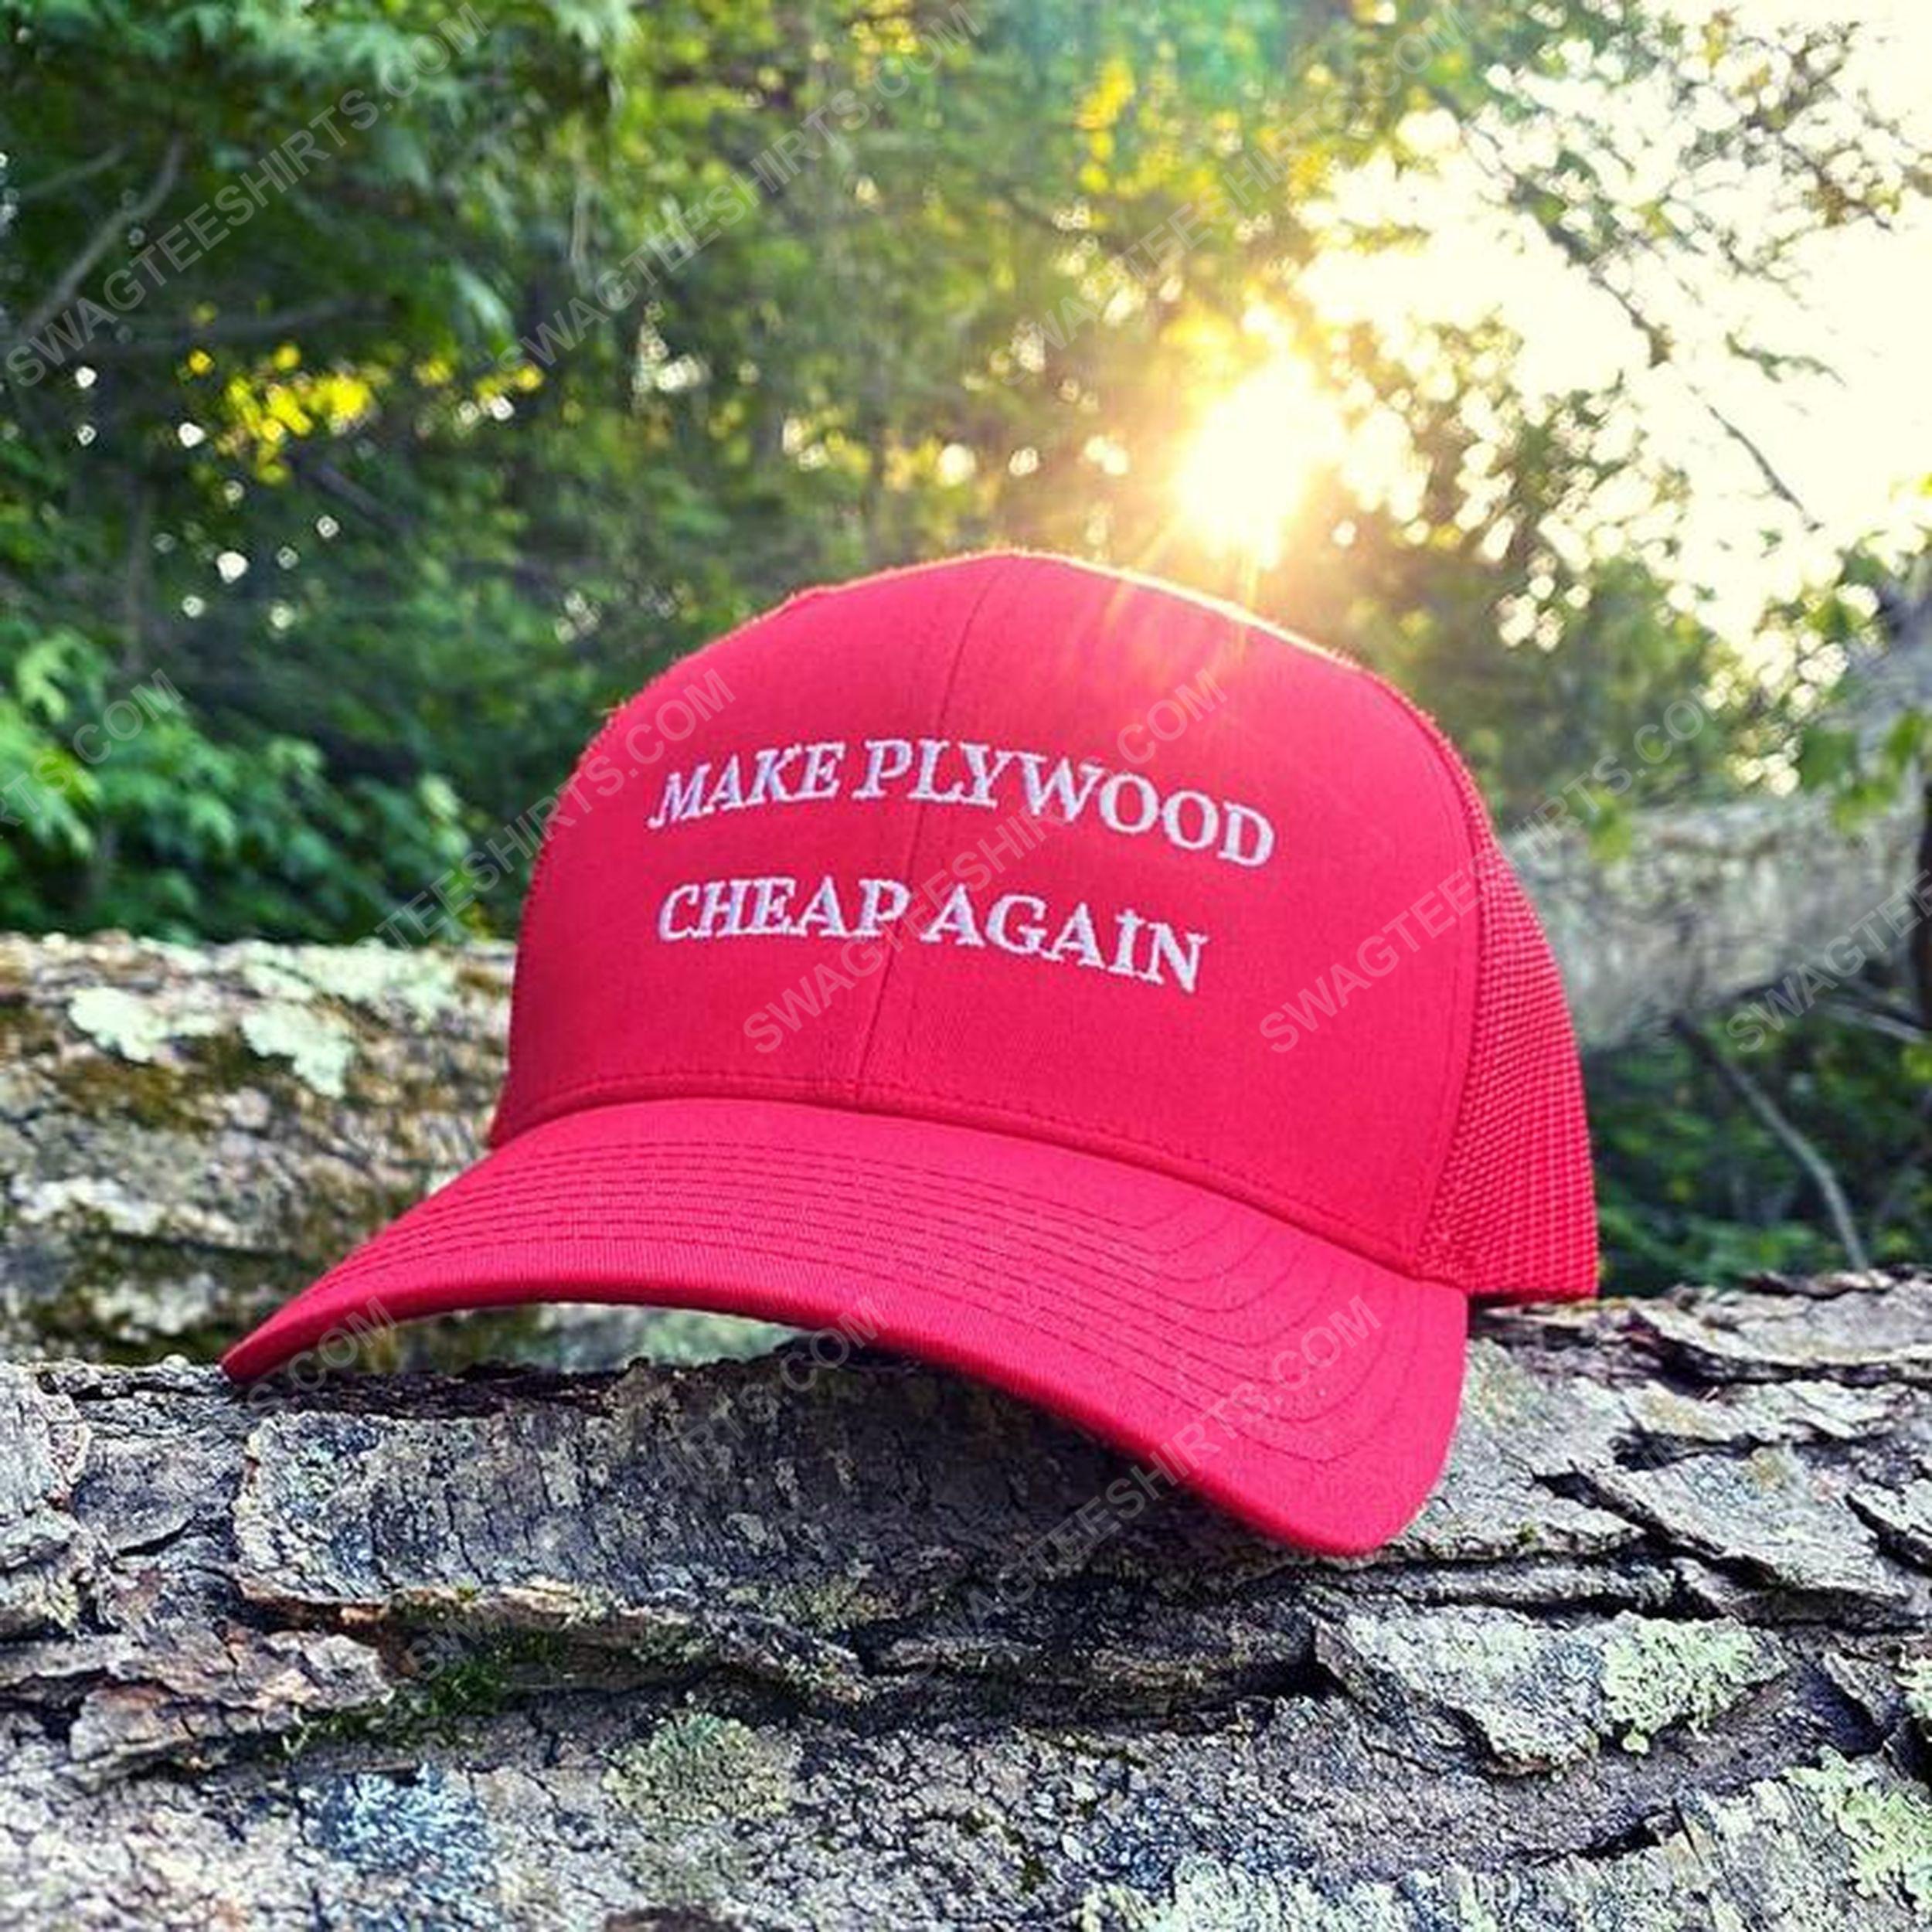 Make plywood cheap again full print classic hat 1 - Copy